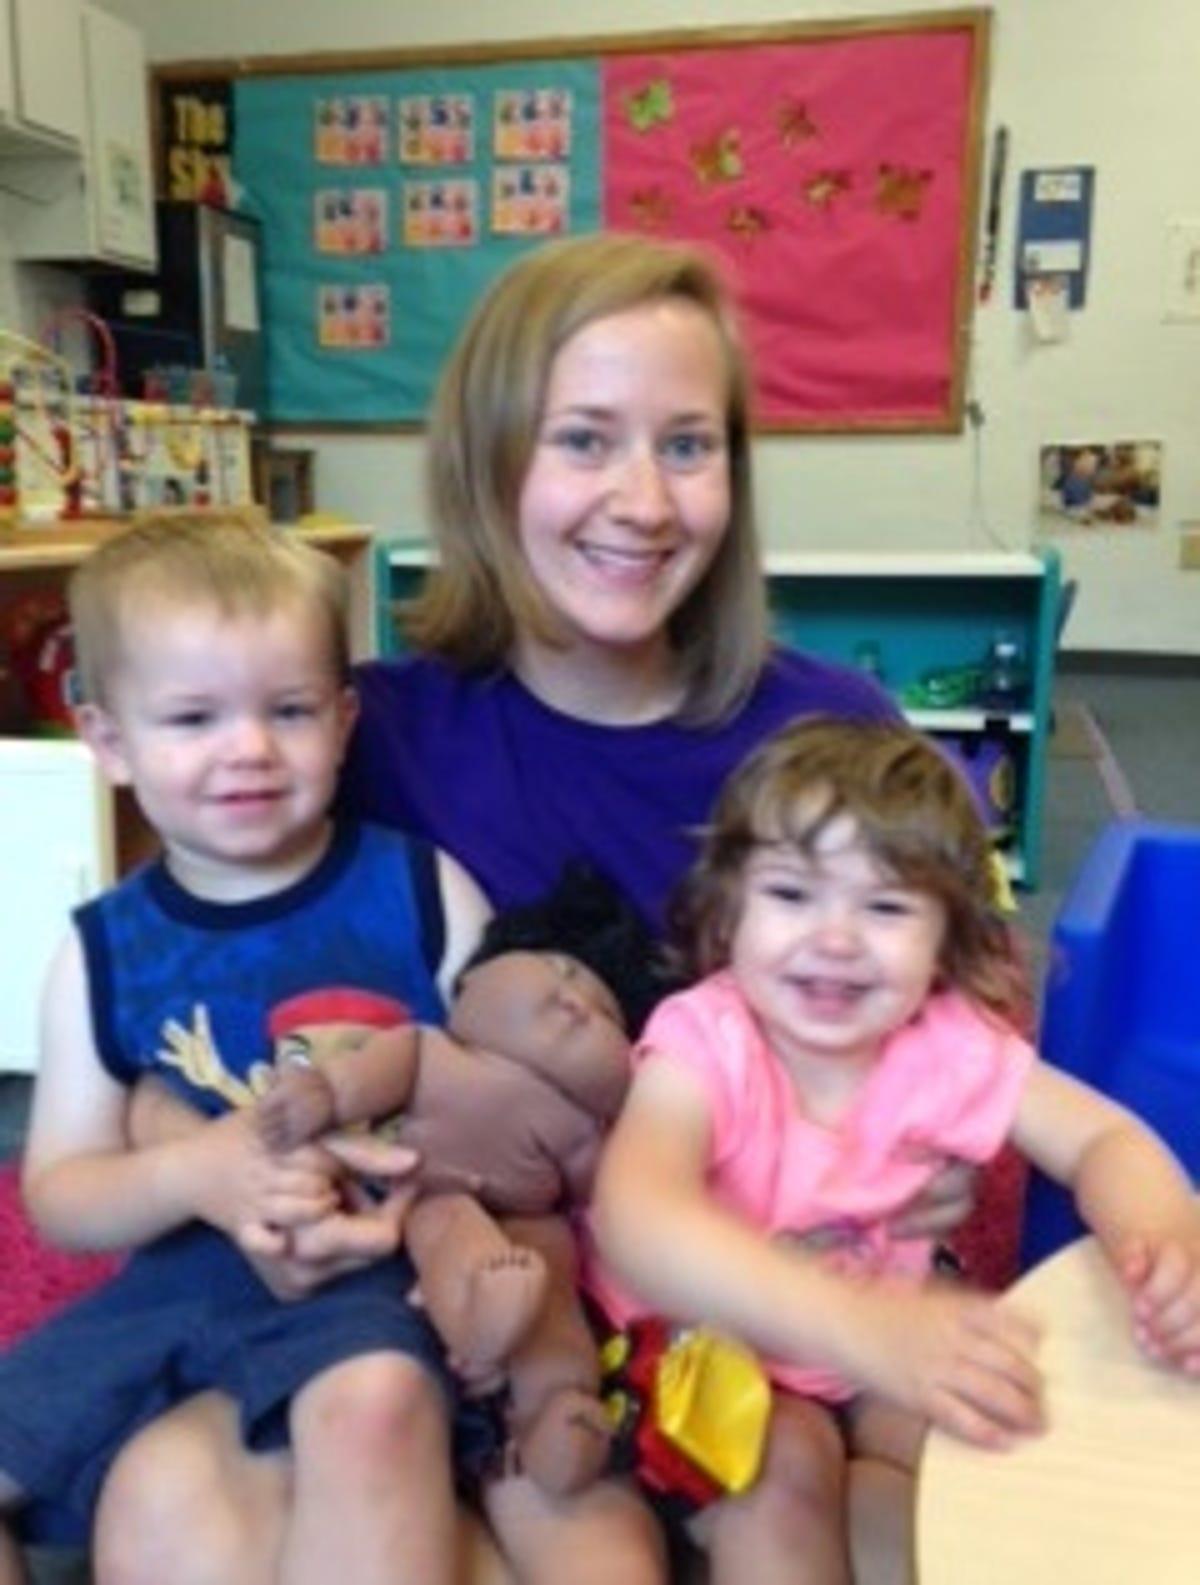 YMCA child care program offers parents peace of mind